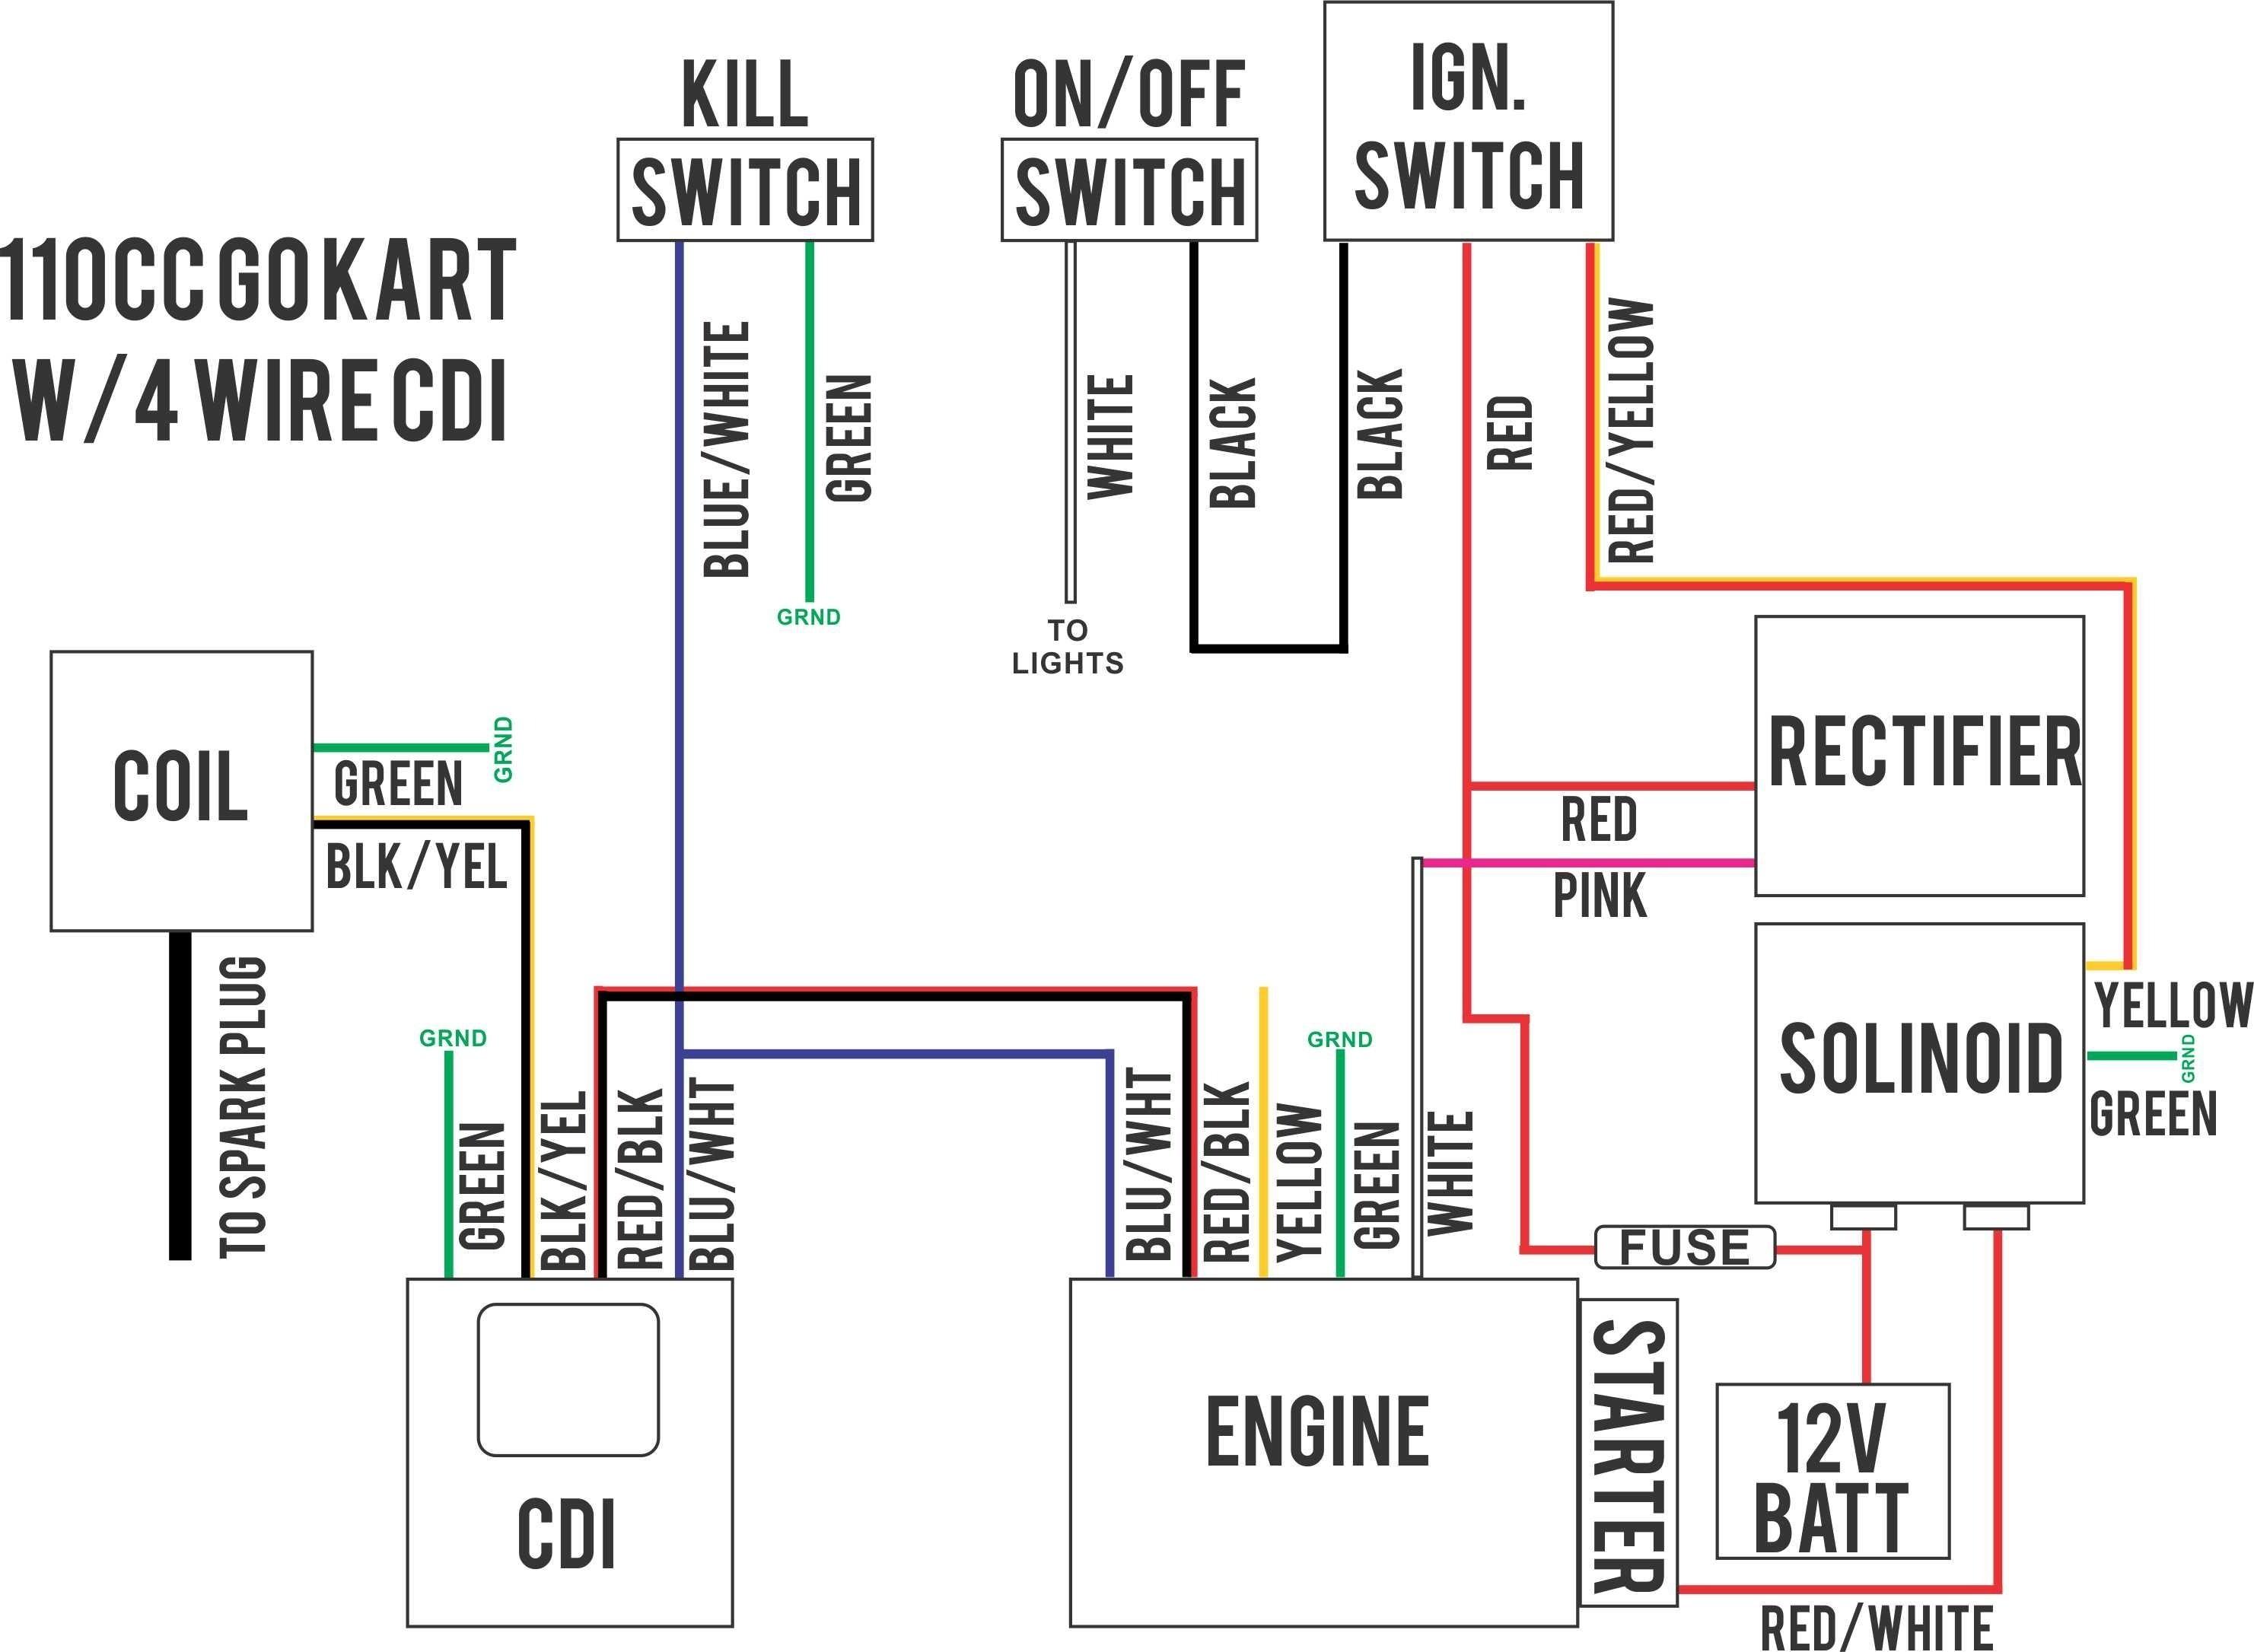 Ignition wiring diagram sephia